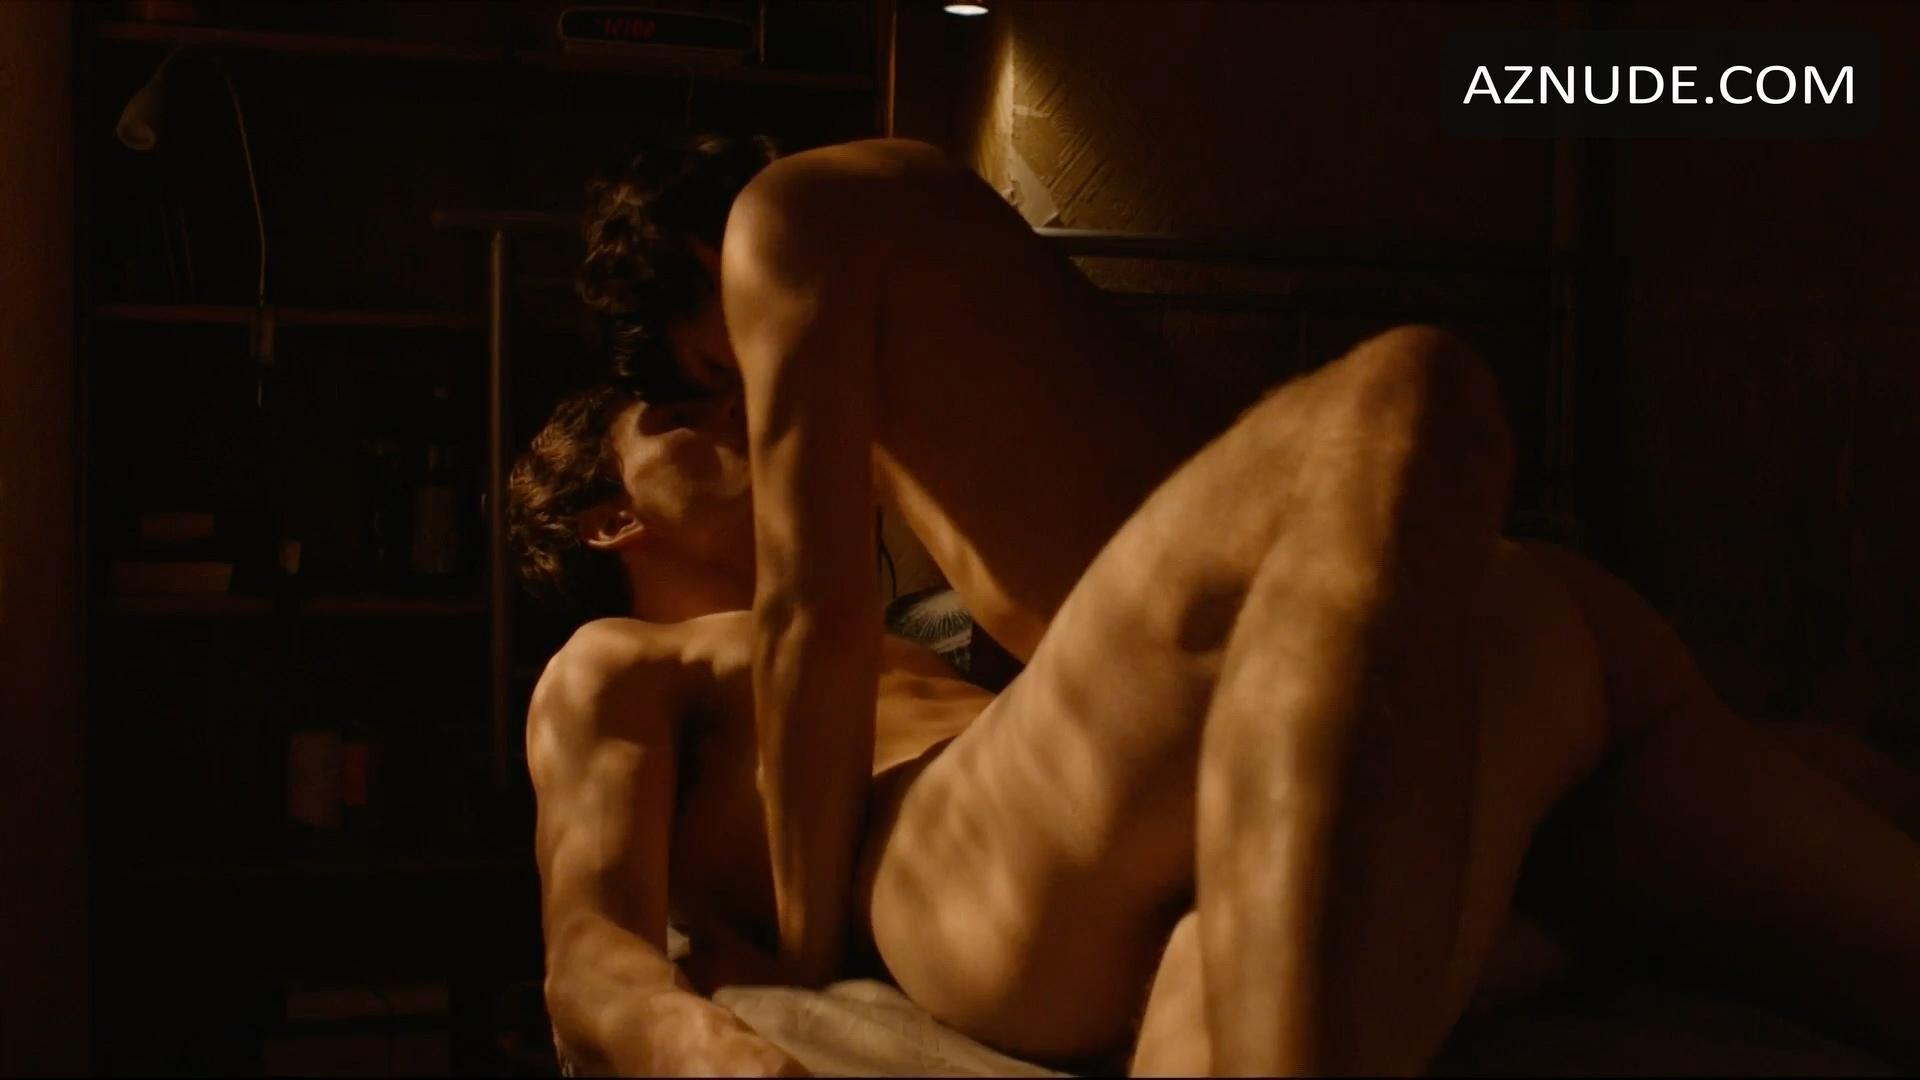 Edward Holcroft Nude - Aznude Men-8354